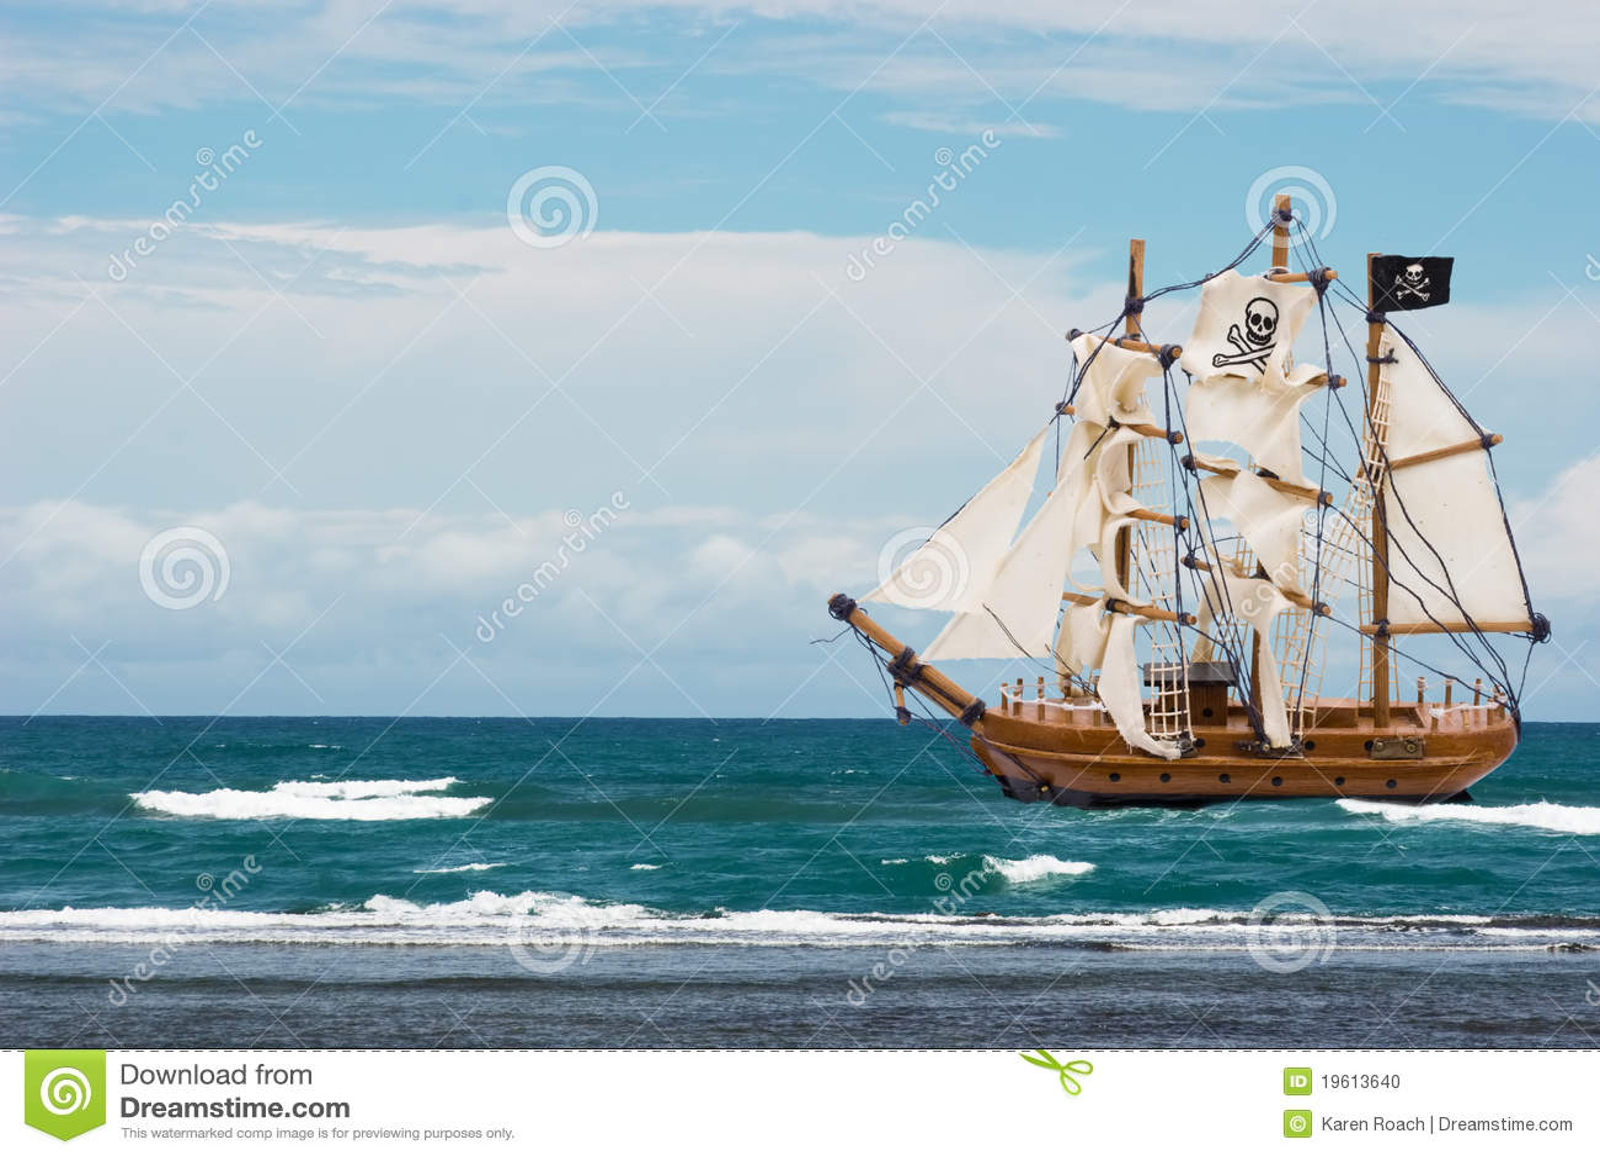 Bateau de pirate photo stock image du sunlight chaud - Photo de bateau pirate ...